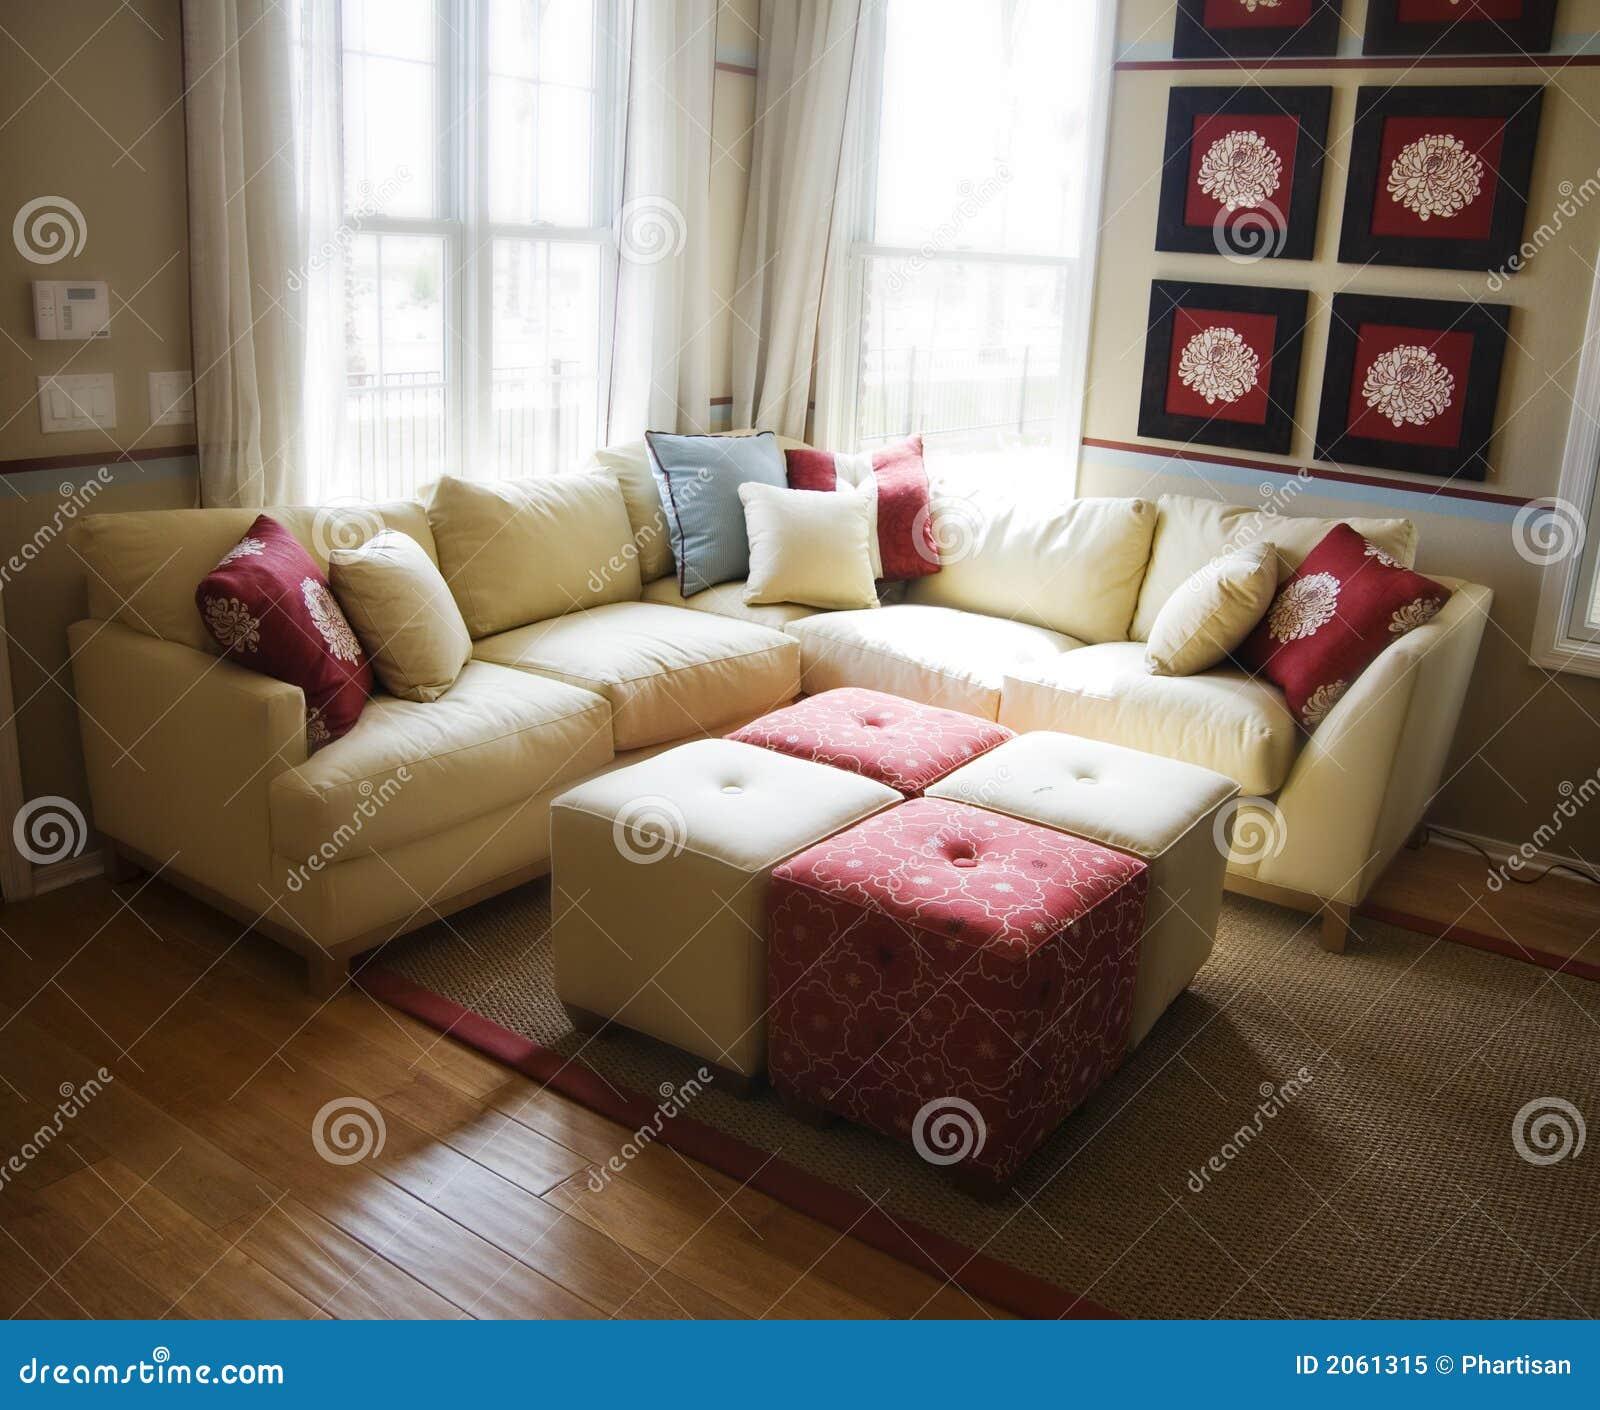 hartholz bodenbelag im wohnzimmer lizenzfreies stockfoto. Black Bedroom Furniture Sets. Home Design Ideas